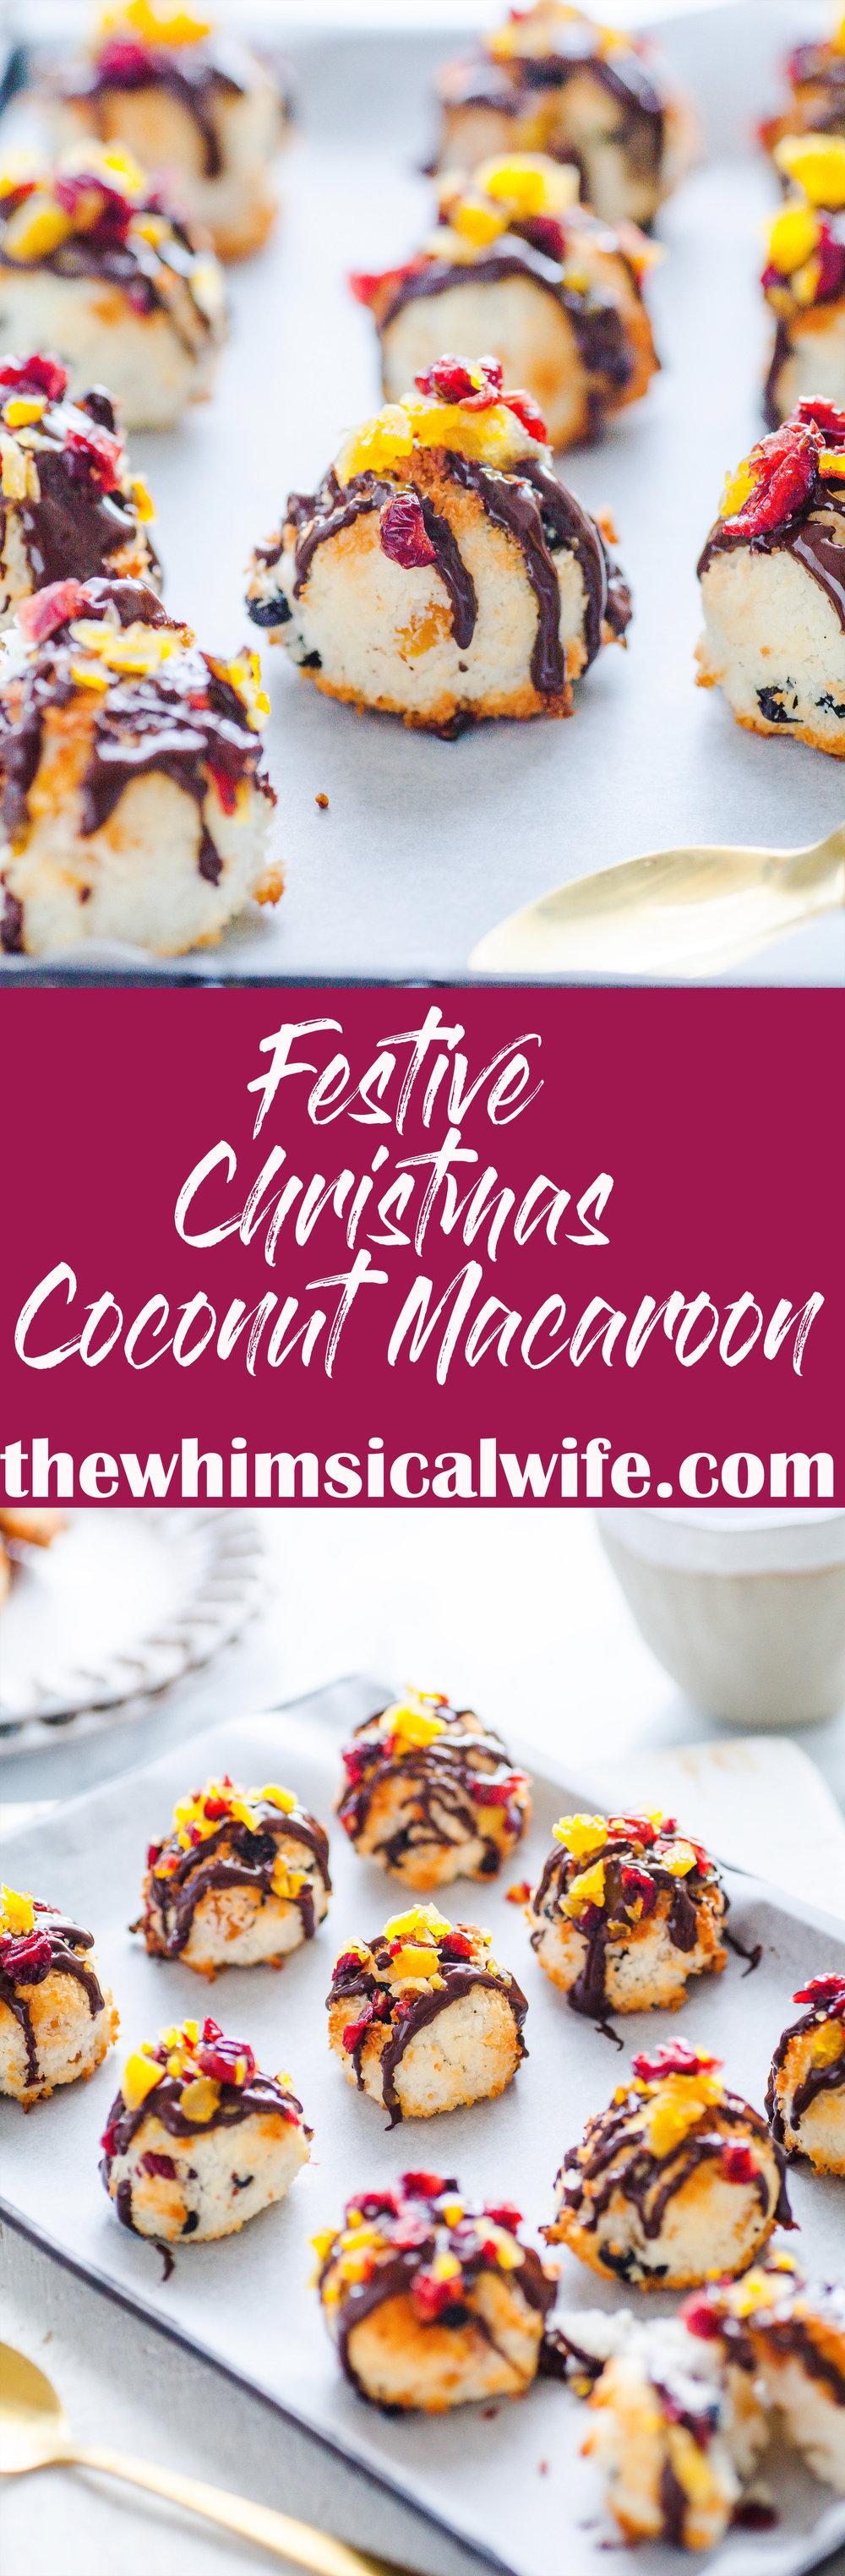 Christmas Coconut Macaroons {GF, DF, Nut Free}